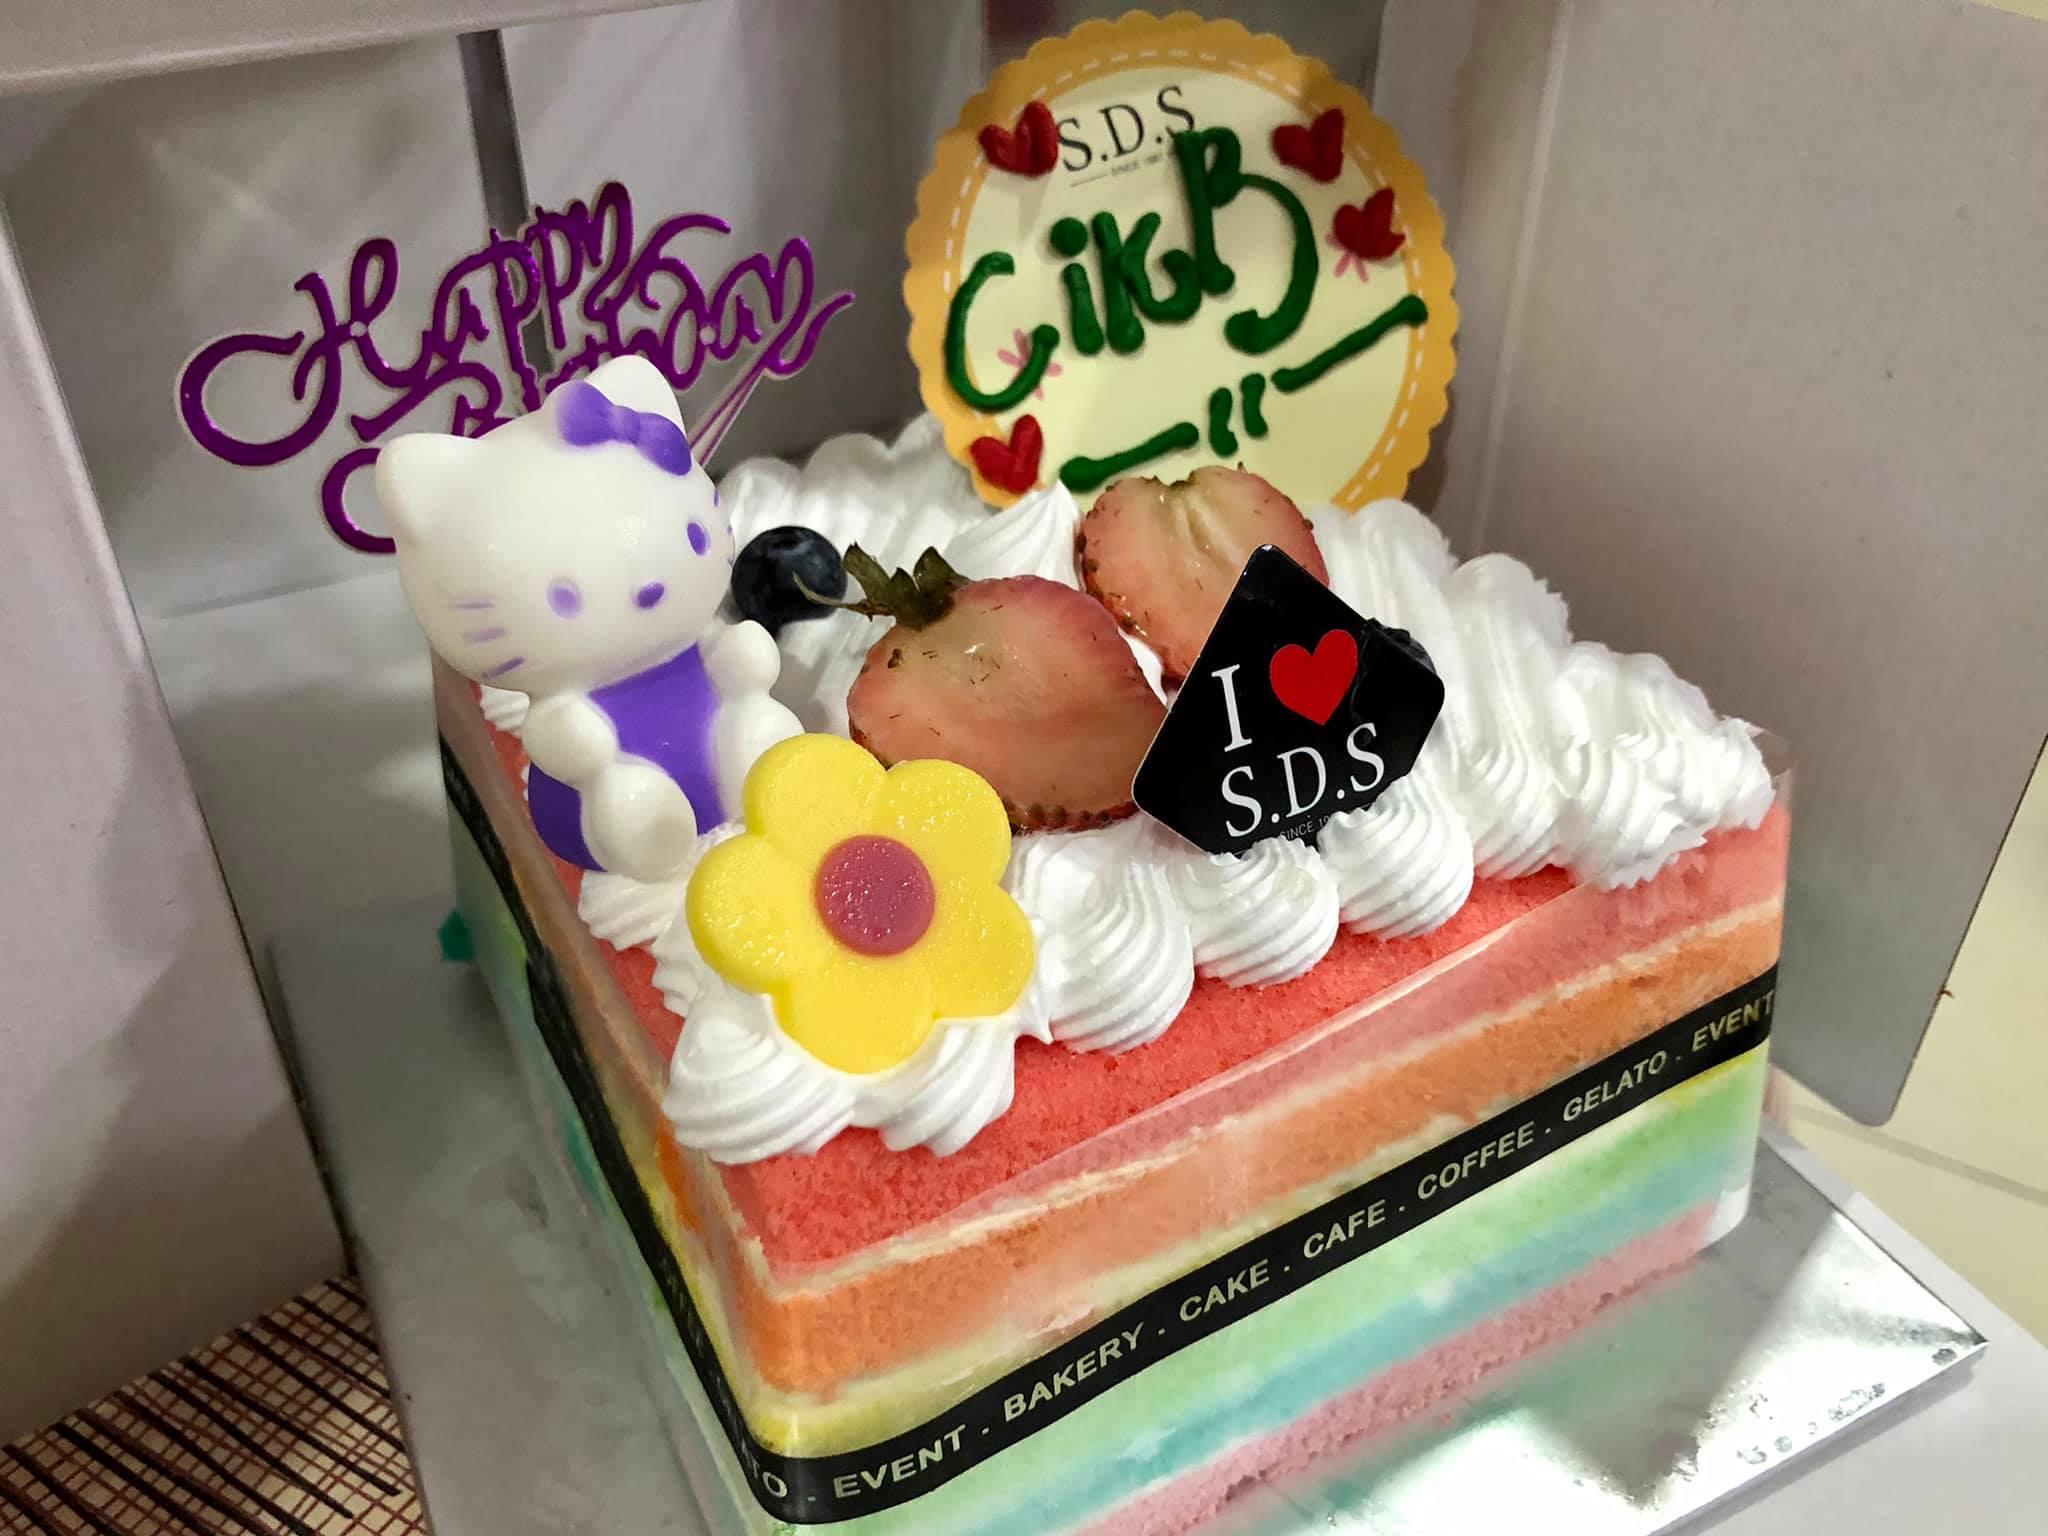 Happy Birthday CikB!